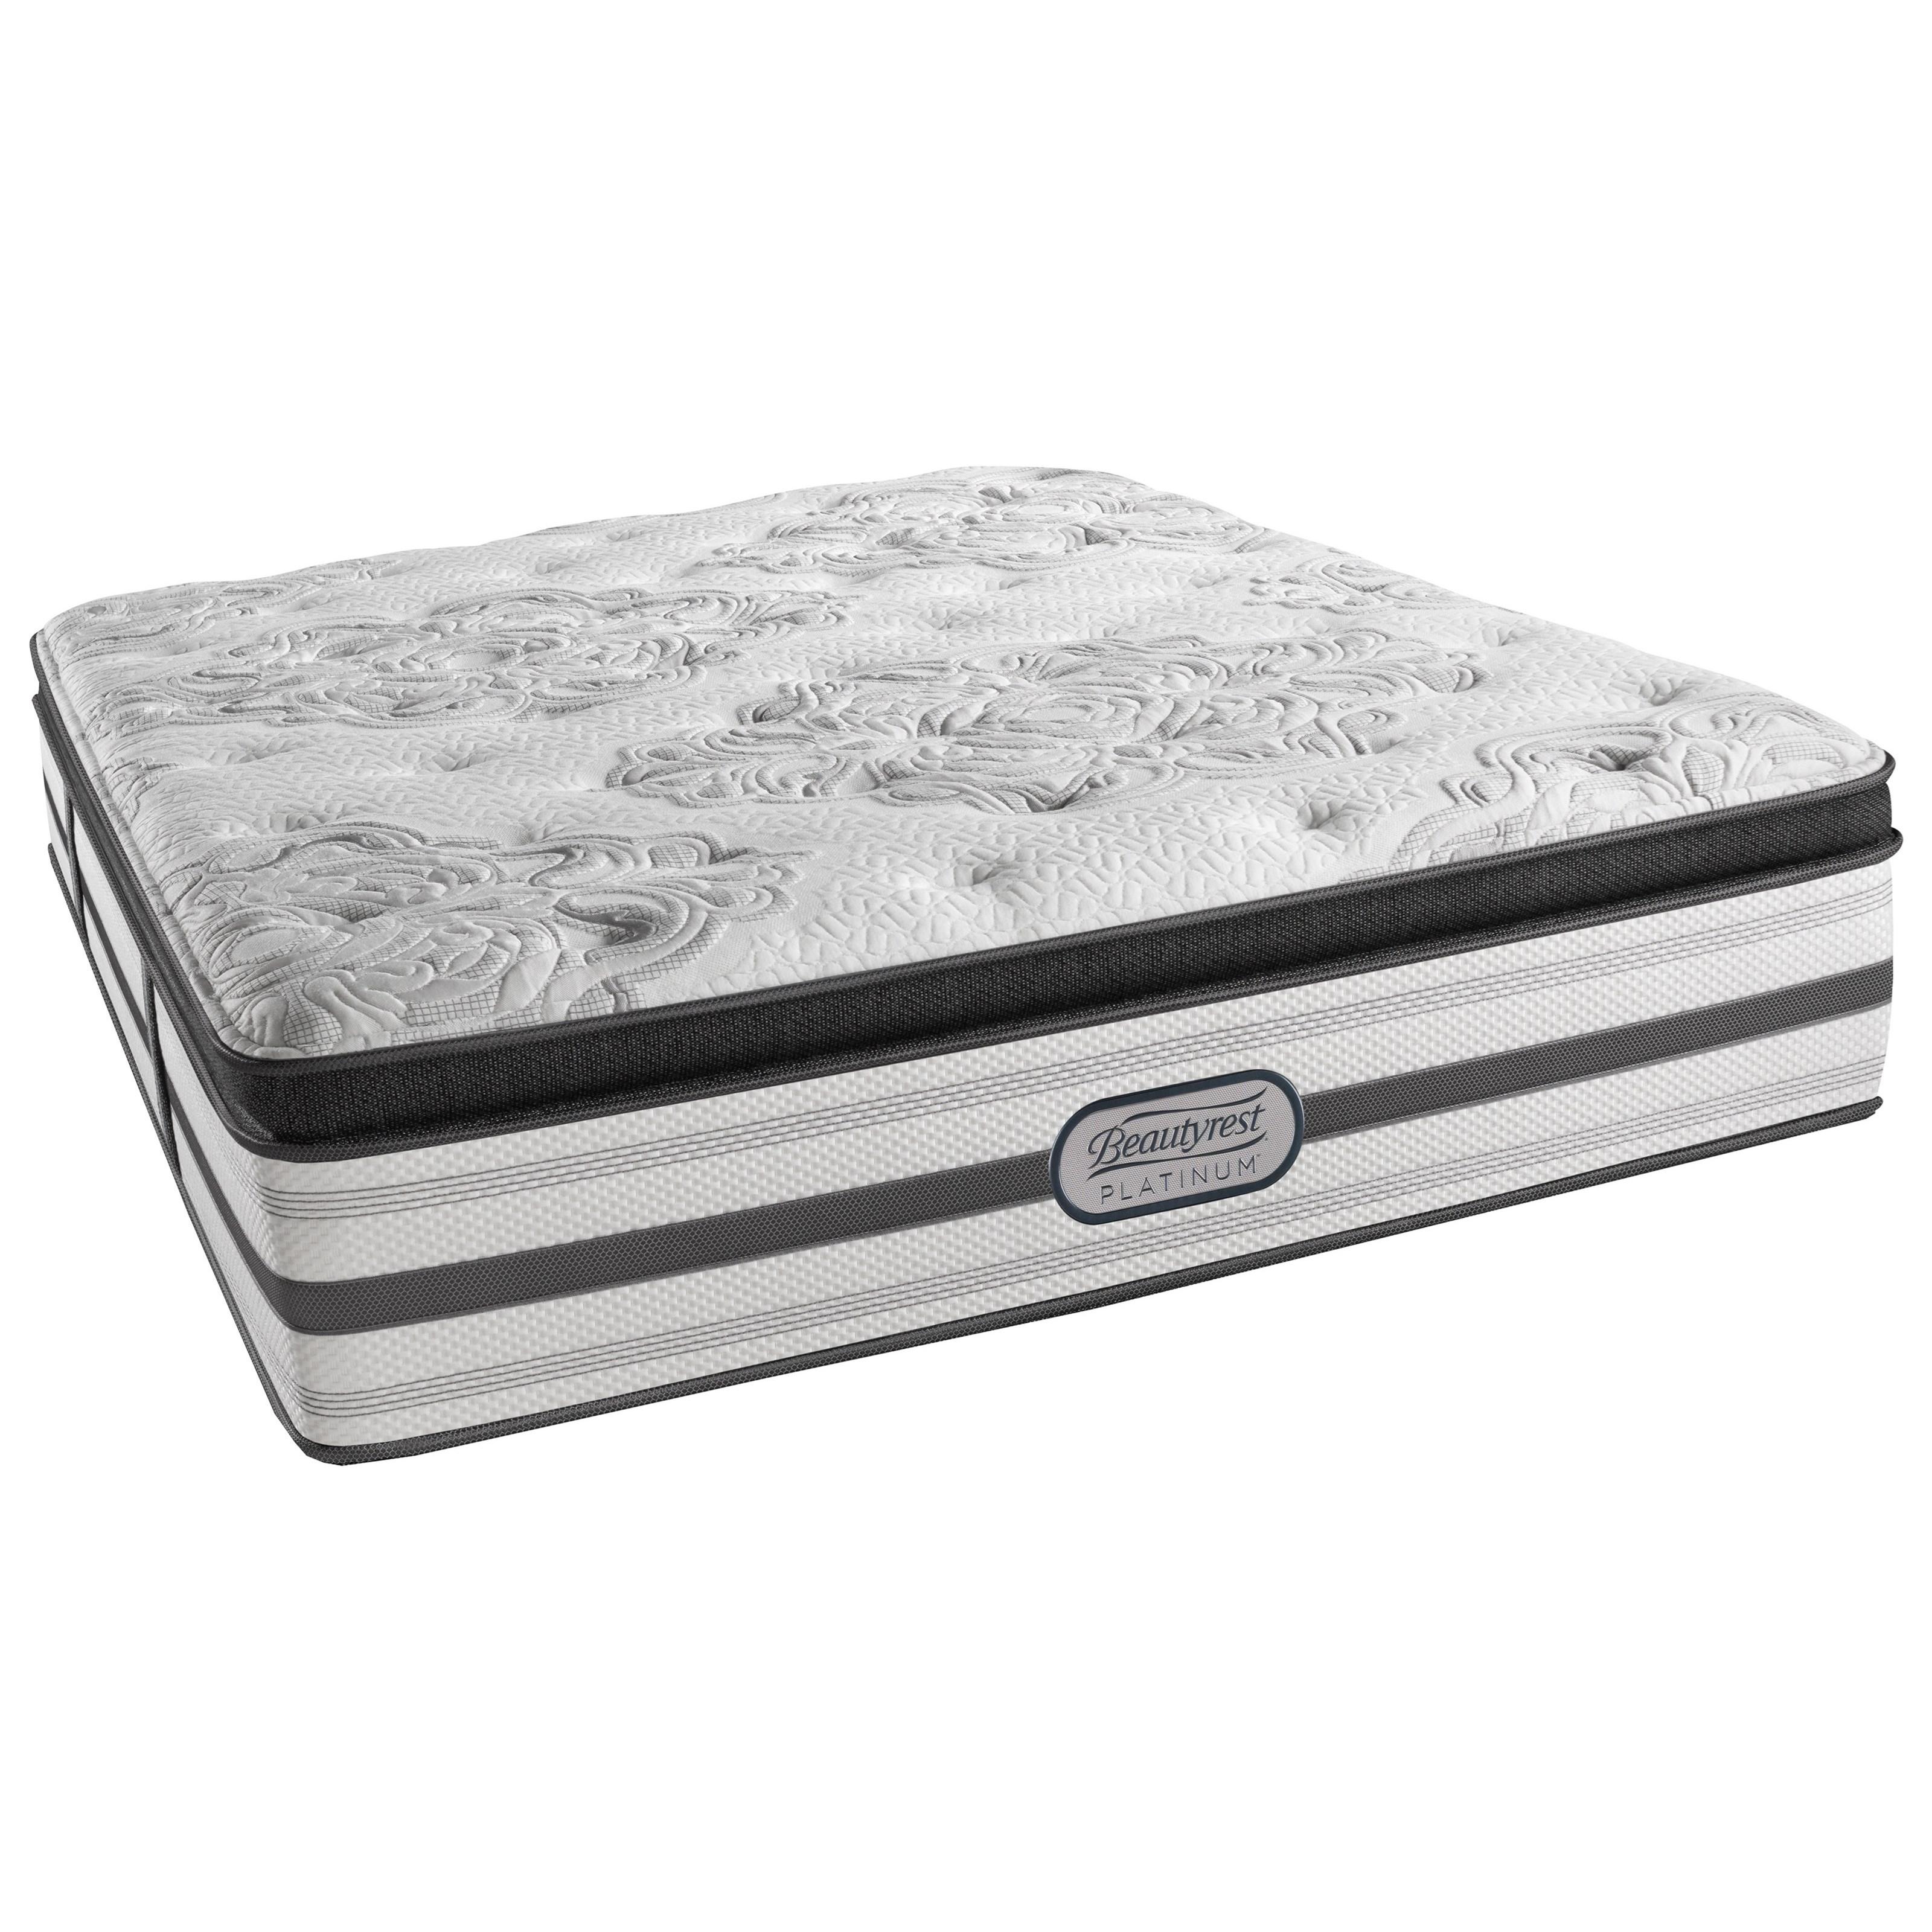 "Beautyrest Platinum Gabriella Queen Luxury Firm PT 15"" Mattress - Item Number: LV3LFPT-Q"